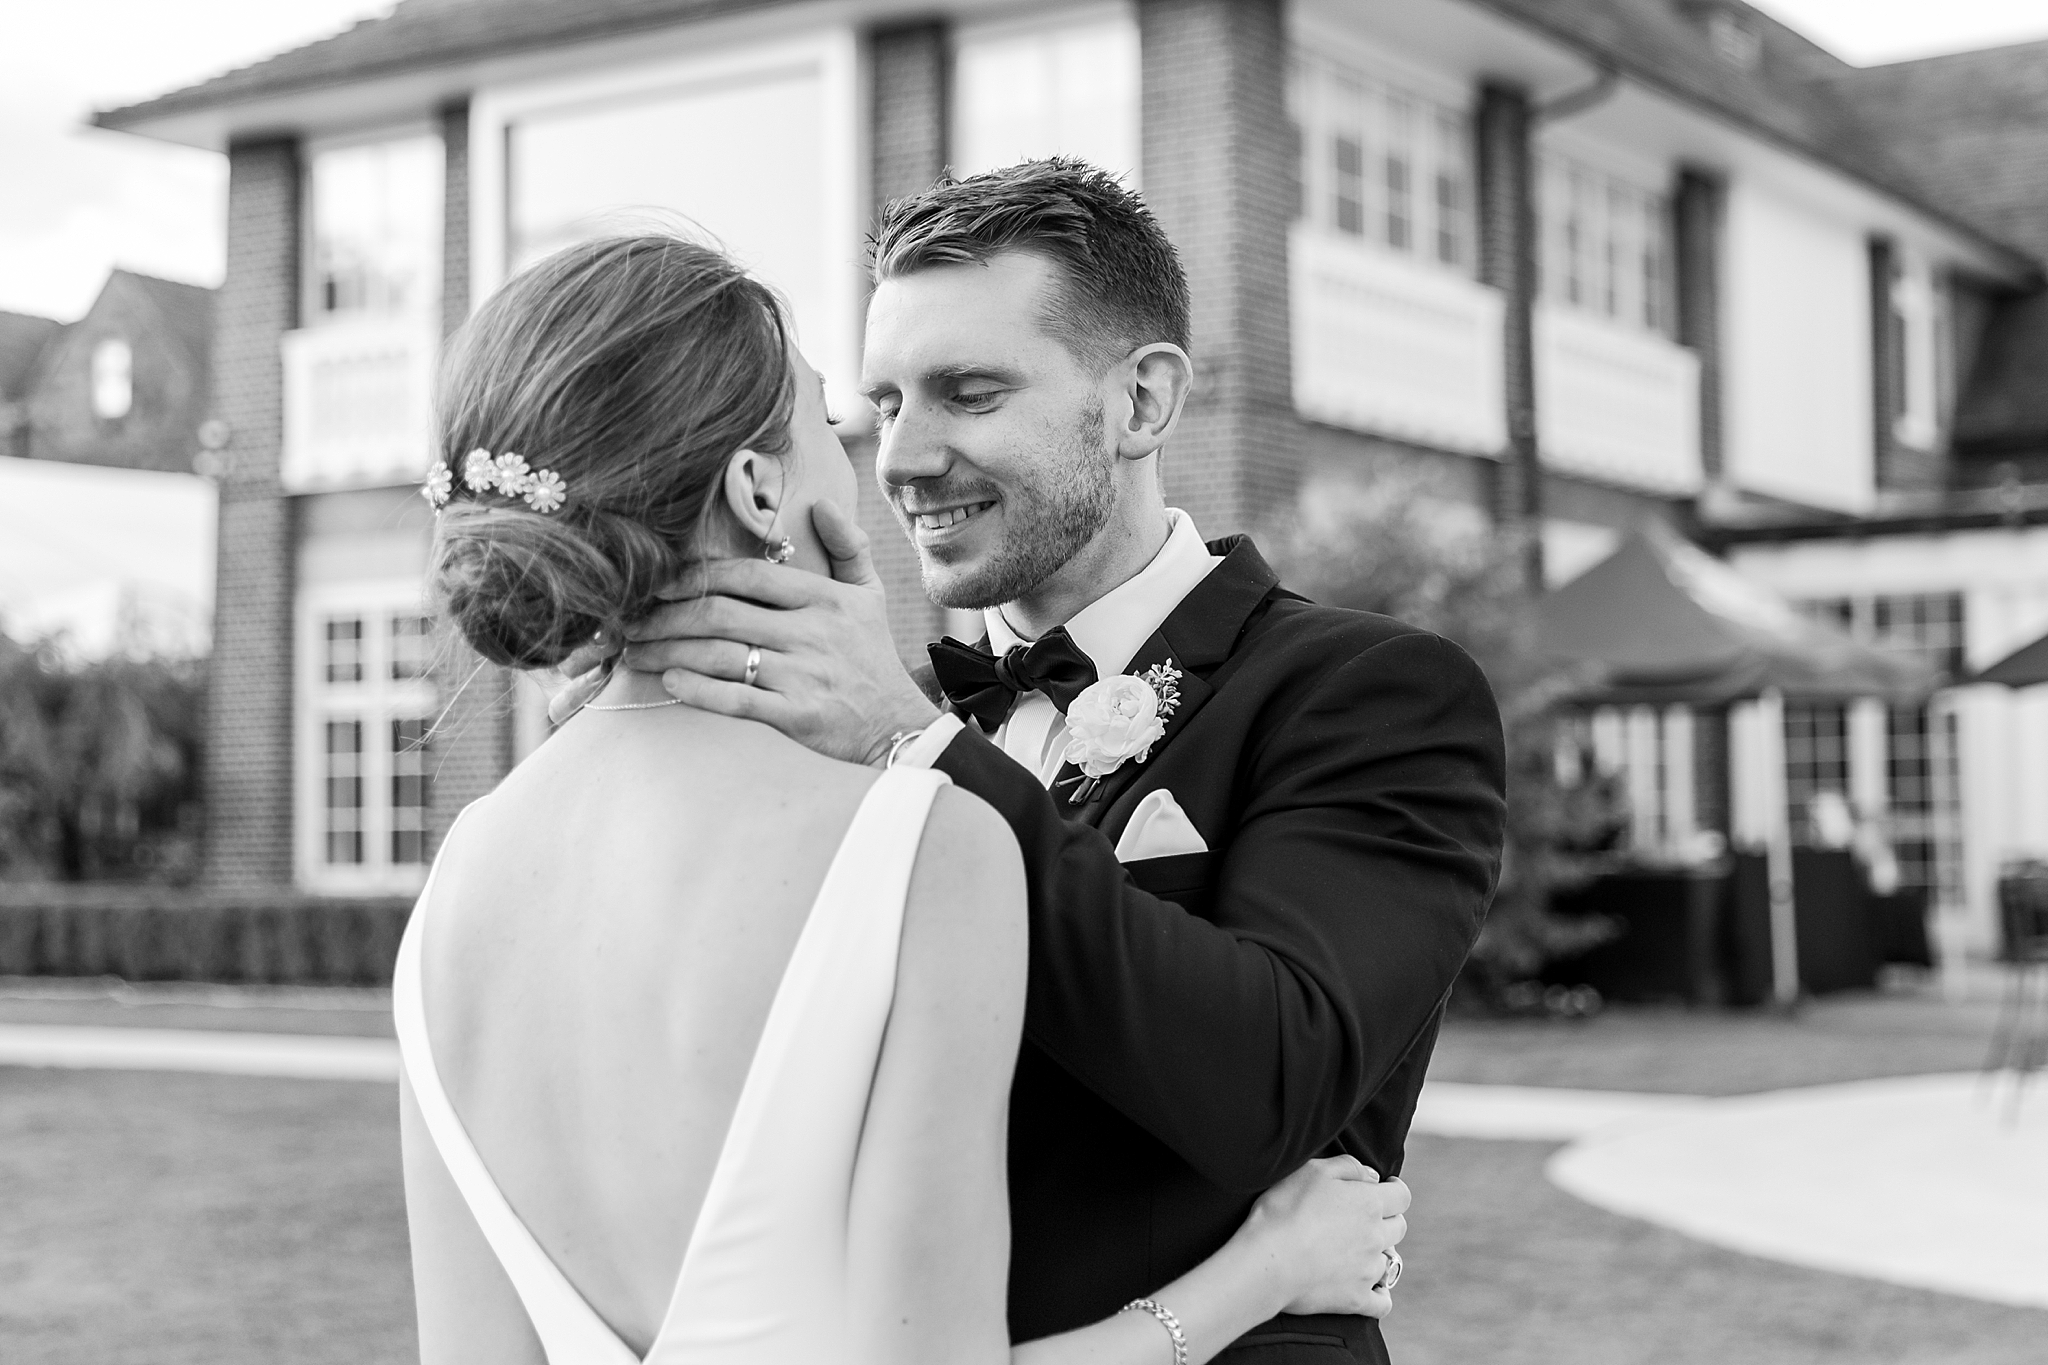 detroit-wedding-photographer-grosse-pointe-academy-chapel-detroit-golf-club-wedding-carly-matt-by-courtney-carolyn-photography_0123.jpg